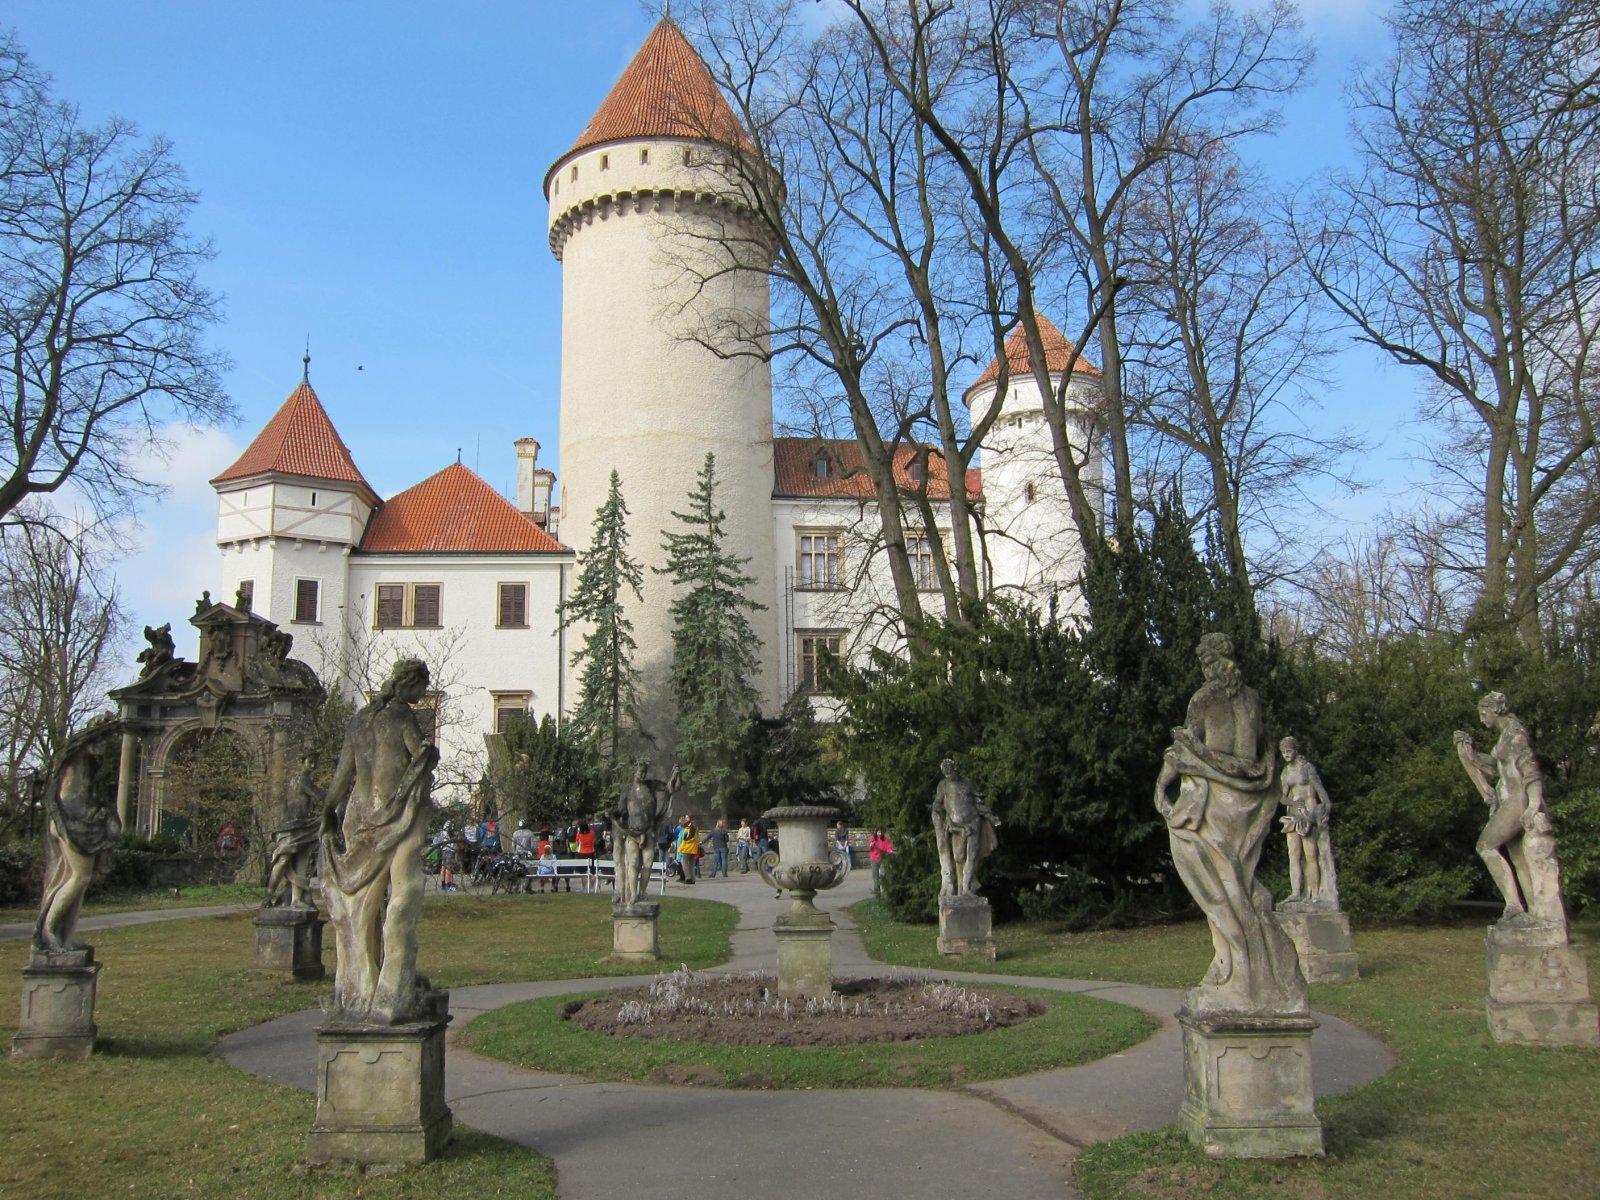 В гости к Францу Фердинанду — замок Конопиште